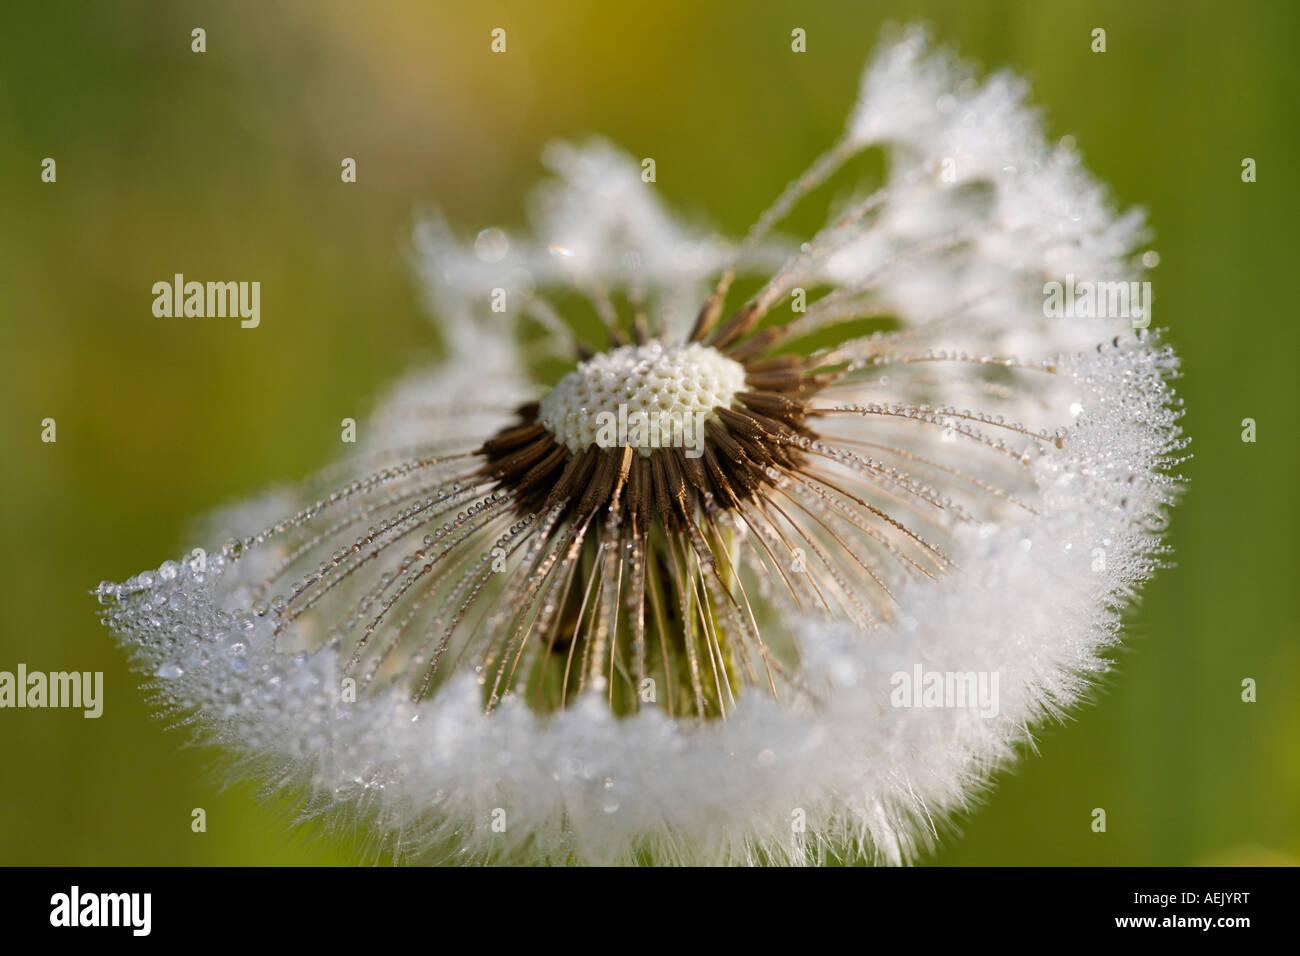 Seedhead clock dandelion, Taraxacum officinale - Stock Image